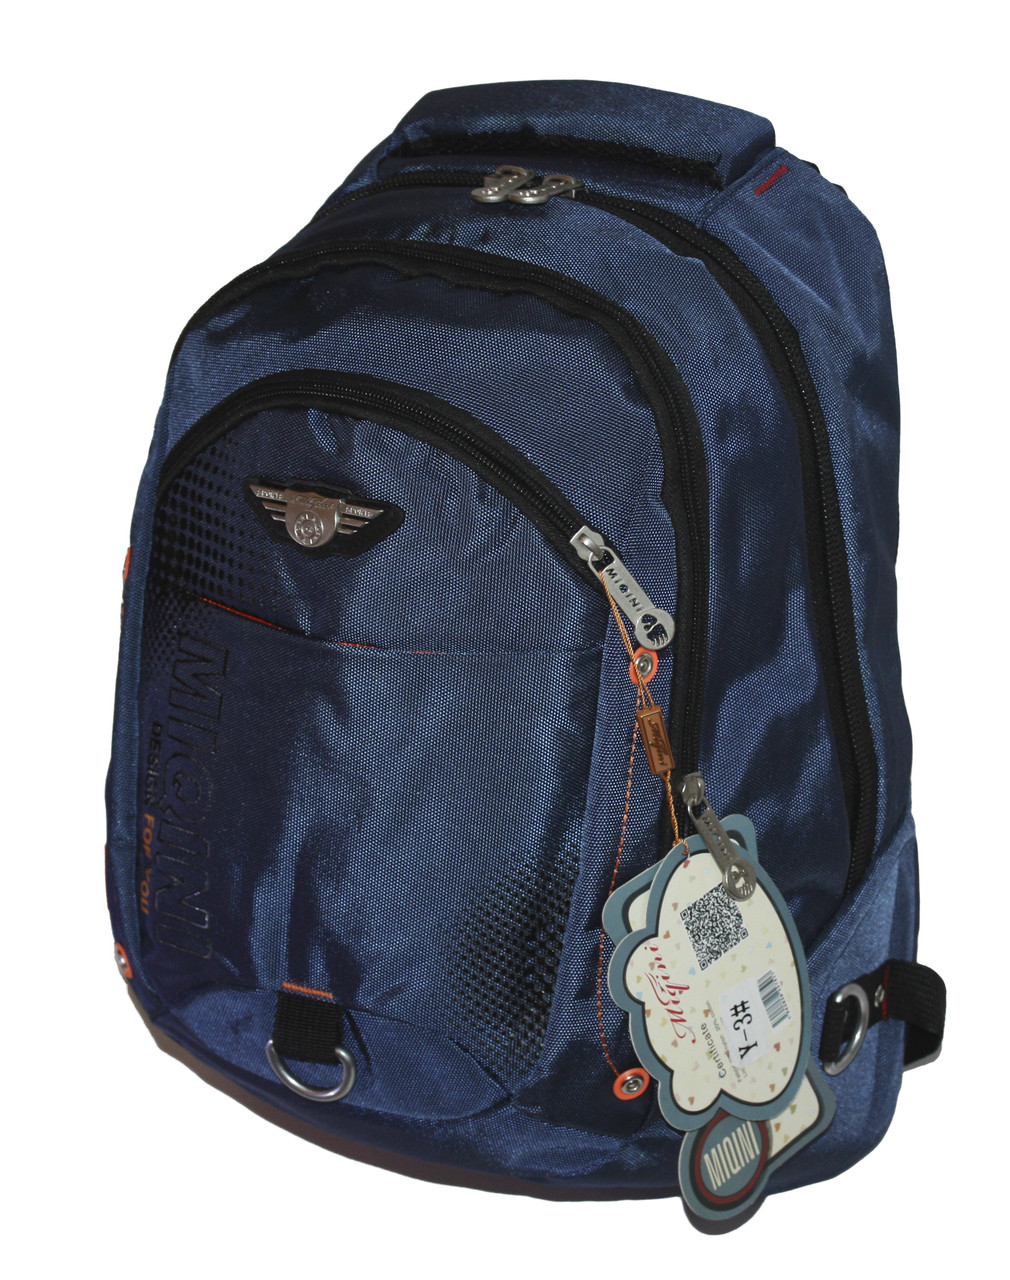 Городской рюкзак 25 литров Синий Miqini Y3